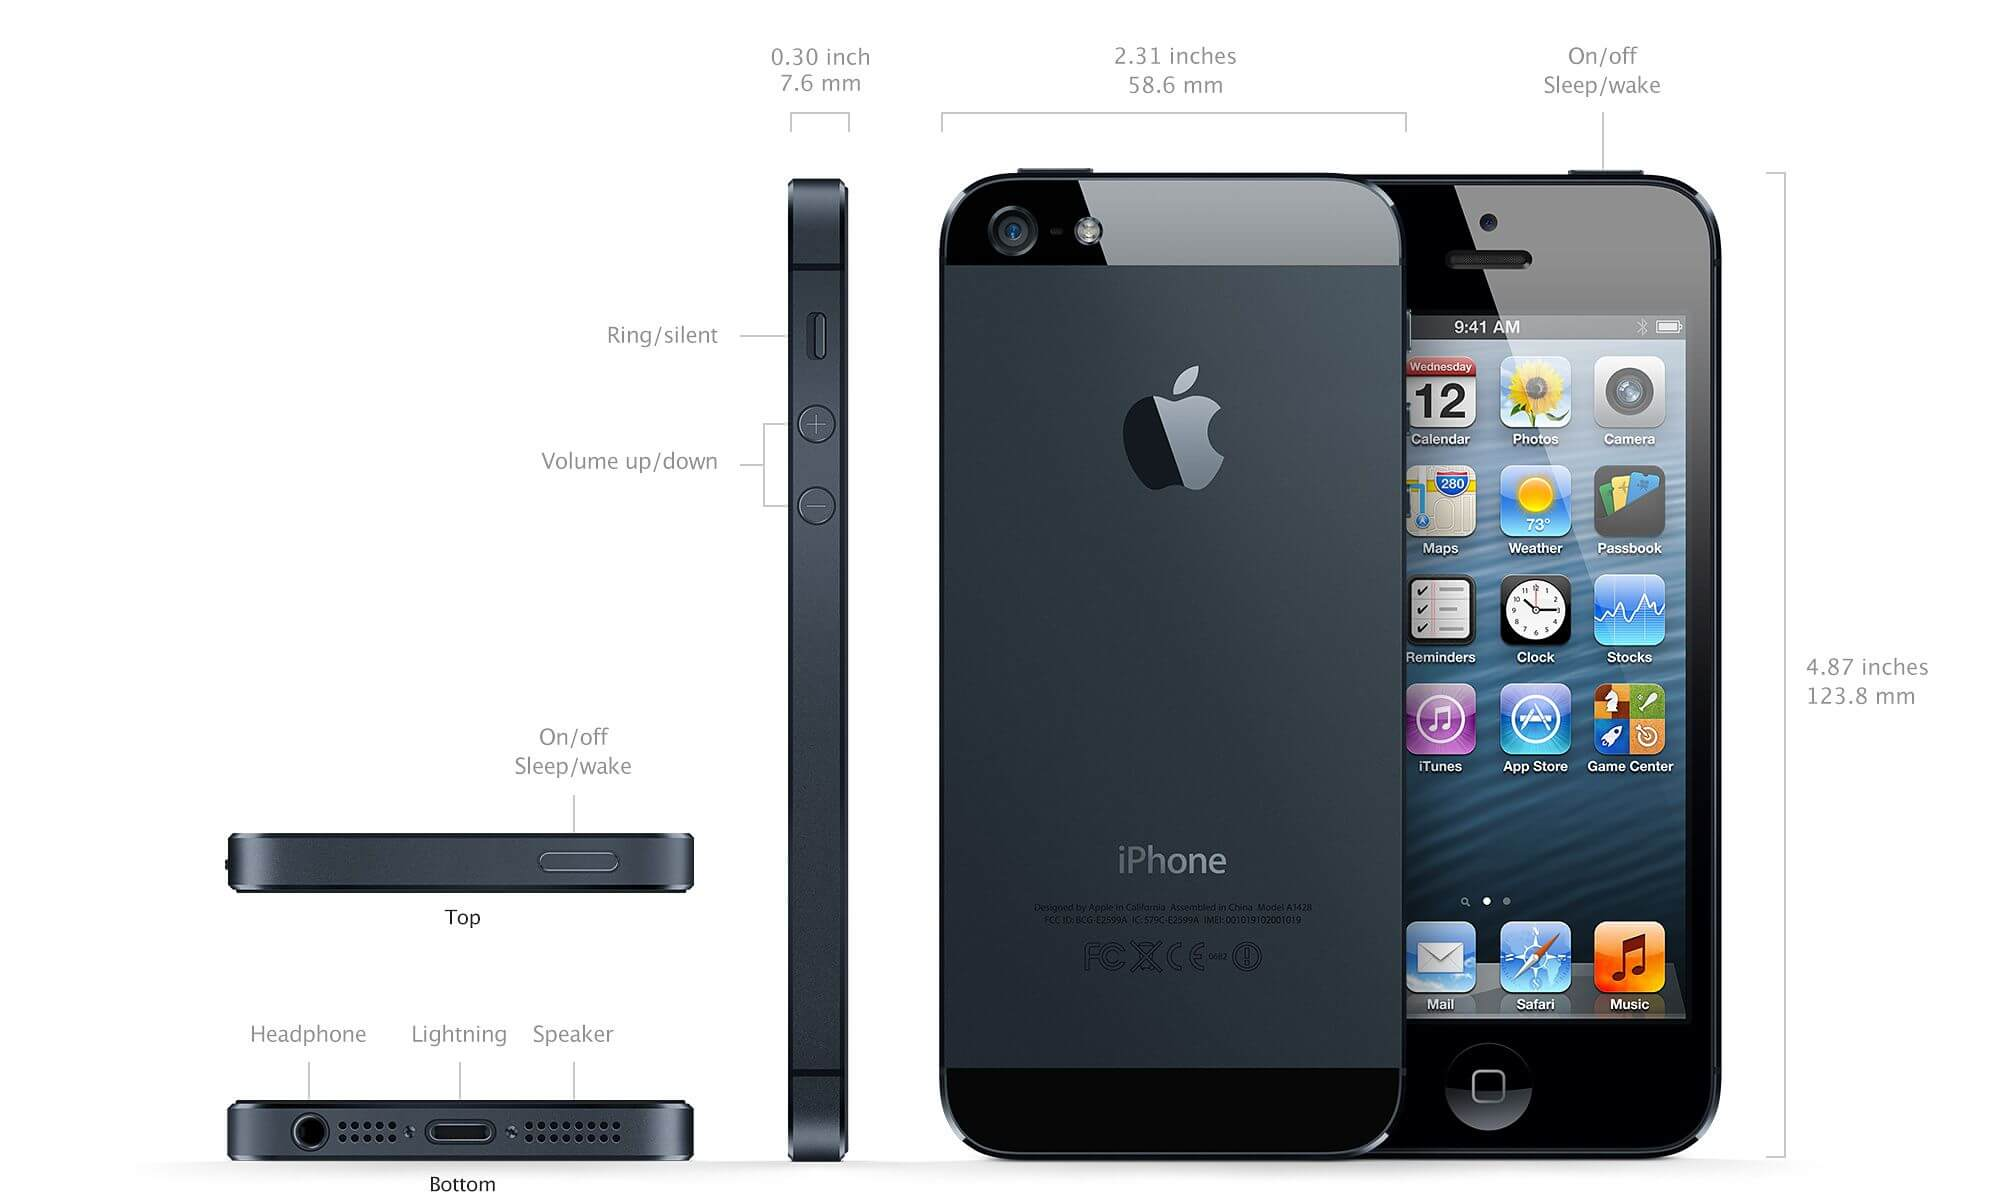 iphone 5s jailbreak price green poison. Black Bedroom Furniture Sets. Home Design Ideas